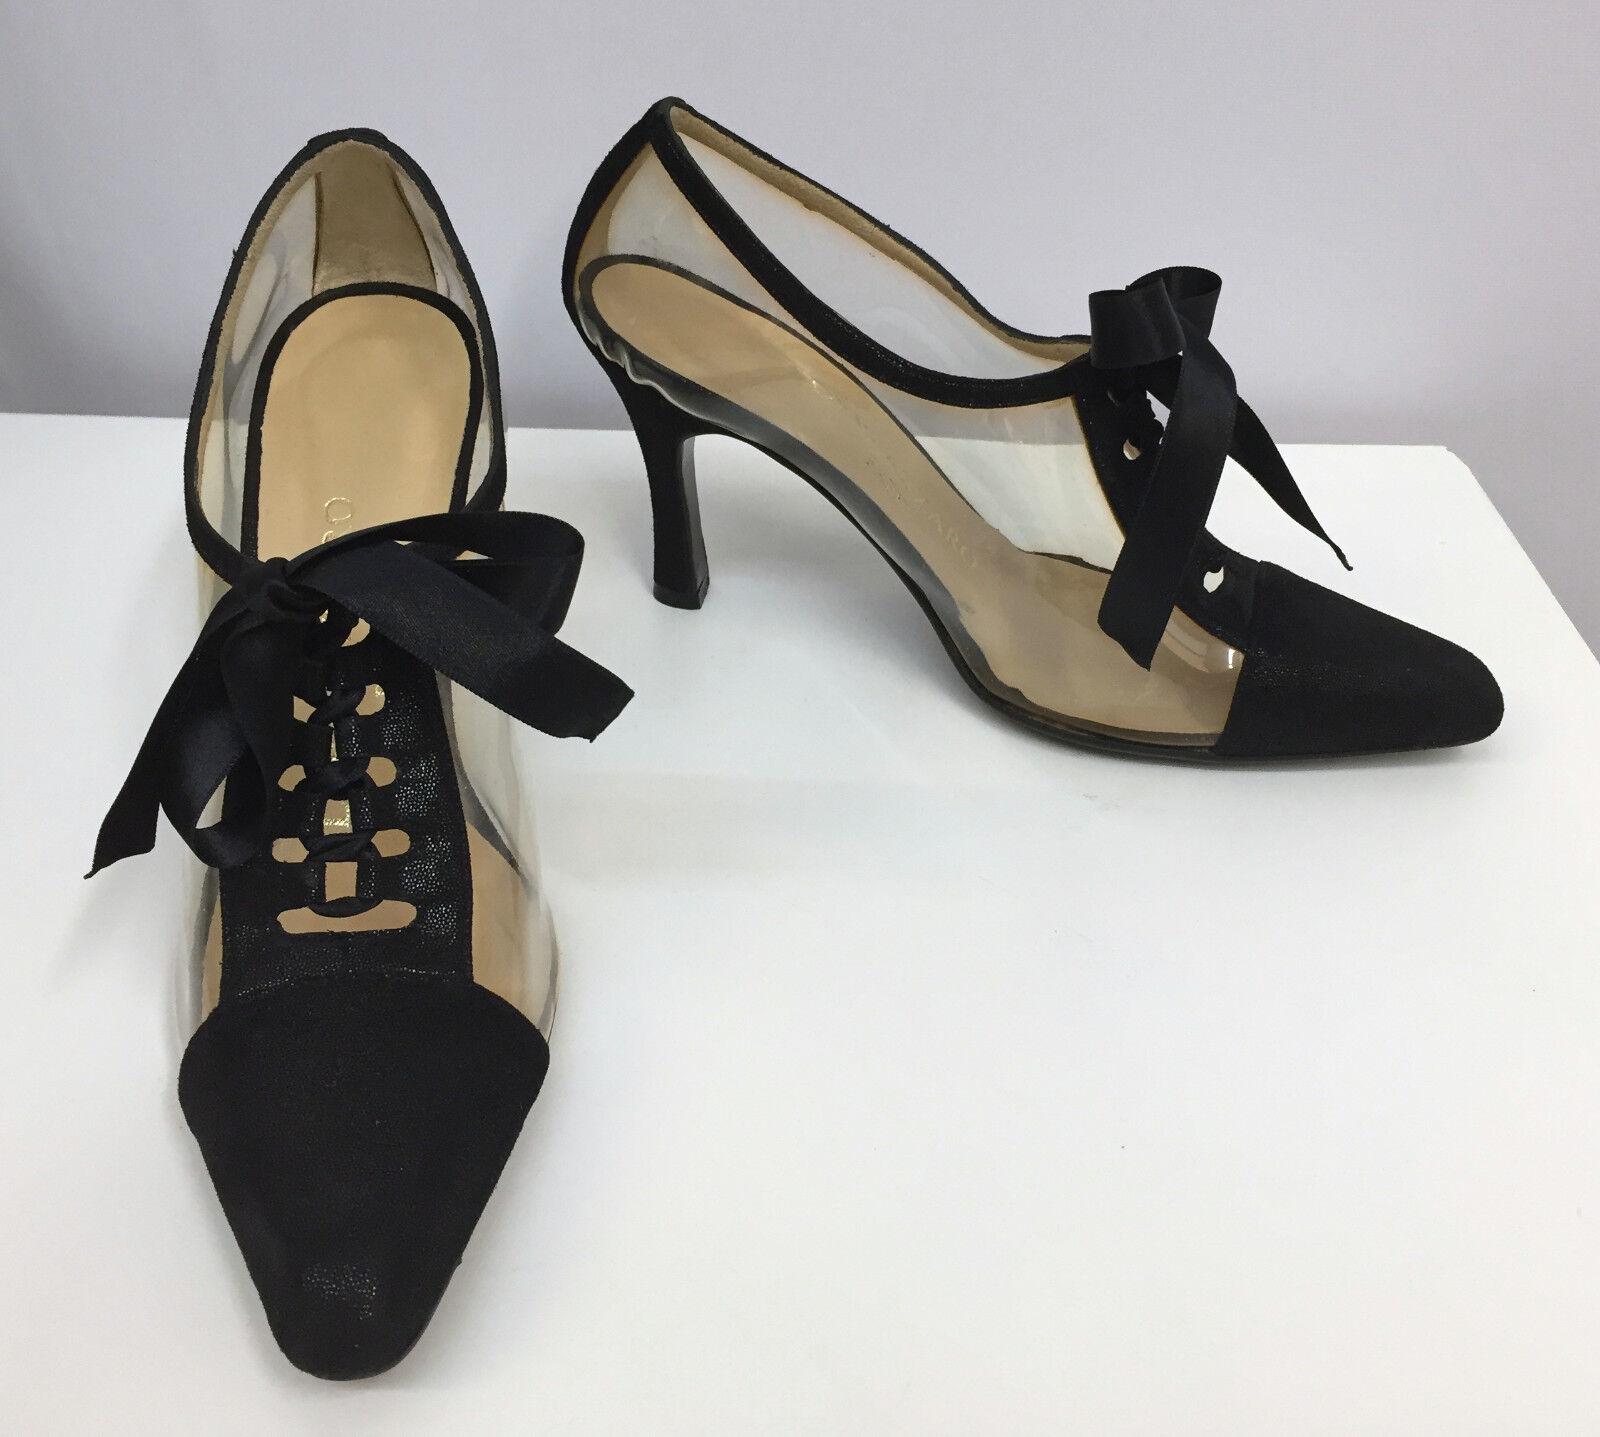 LORIS AZZARO scarpe NEW nero METALLIC LEATHER LACE UPs CLEAR PLASTIC 3 1 2 5 1 2